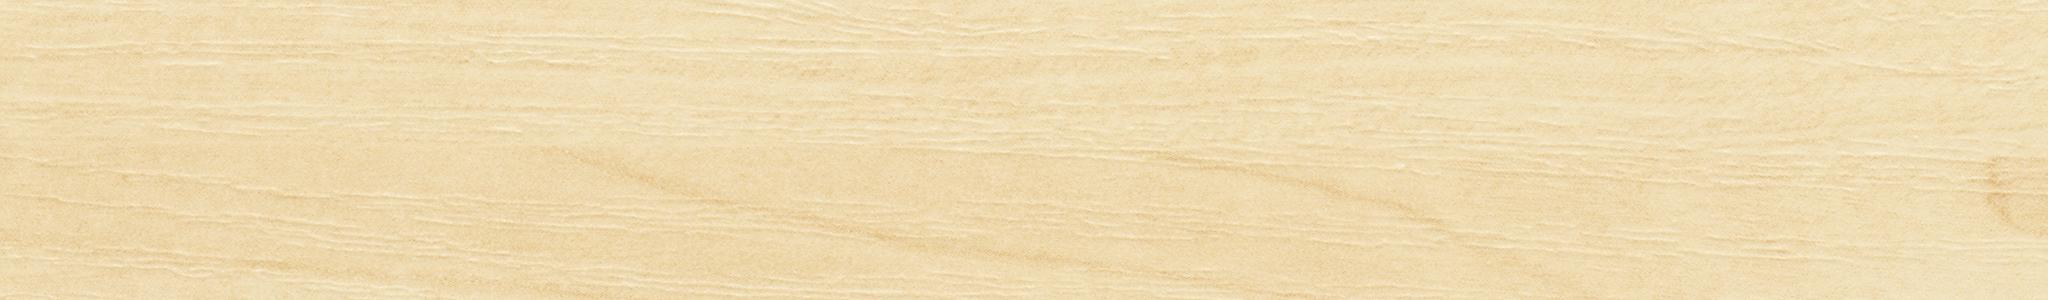 HD 47357 Melamin Kante Birke Pore